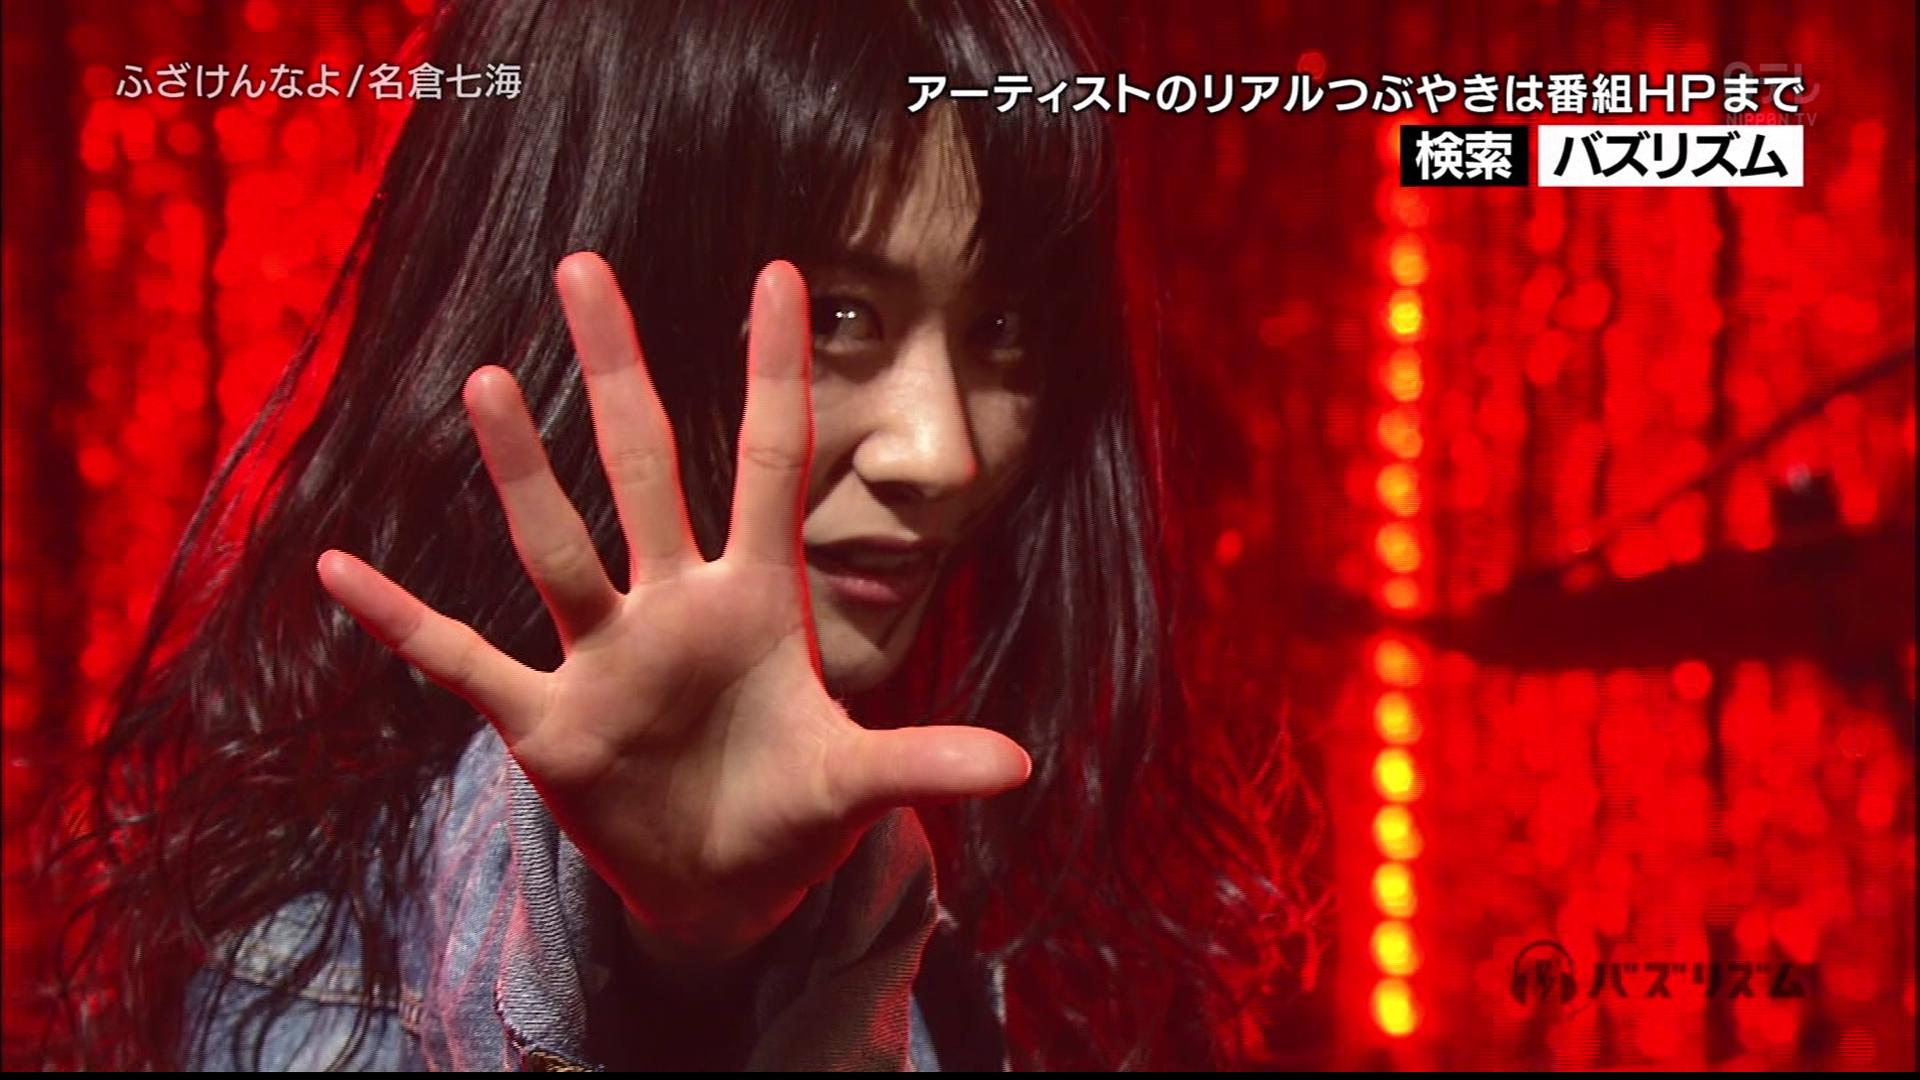 20161103.01.24 Nanami Nagura - Fuzaken na yo (Buzz Rhythm 2015.04.10 HDTV) (JPOP.ru).ts 1.jpg